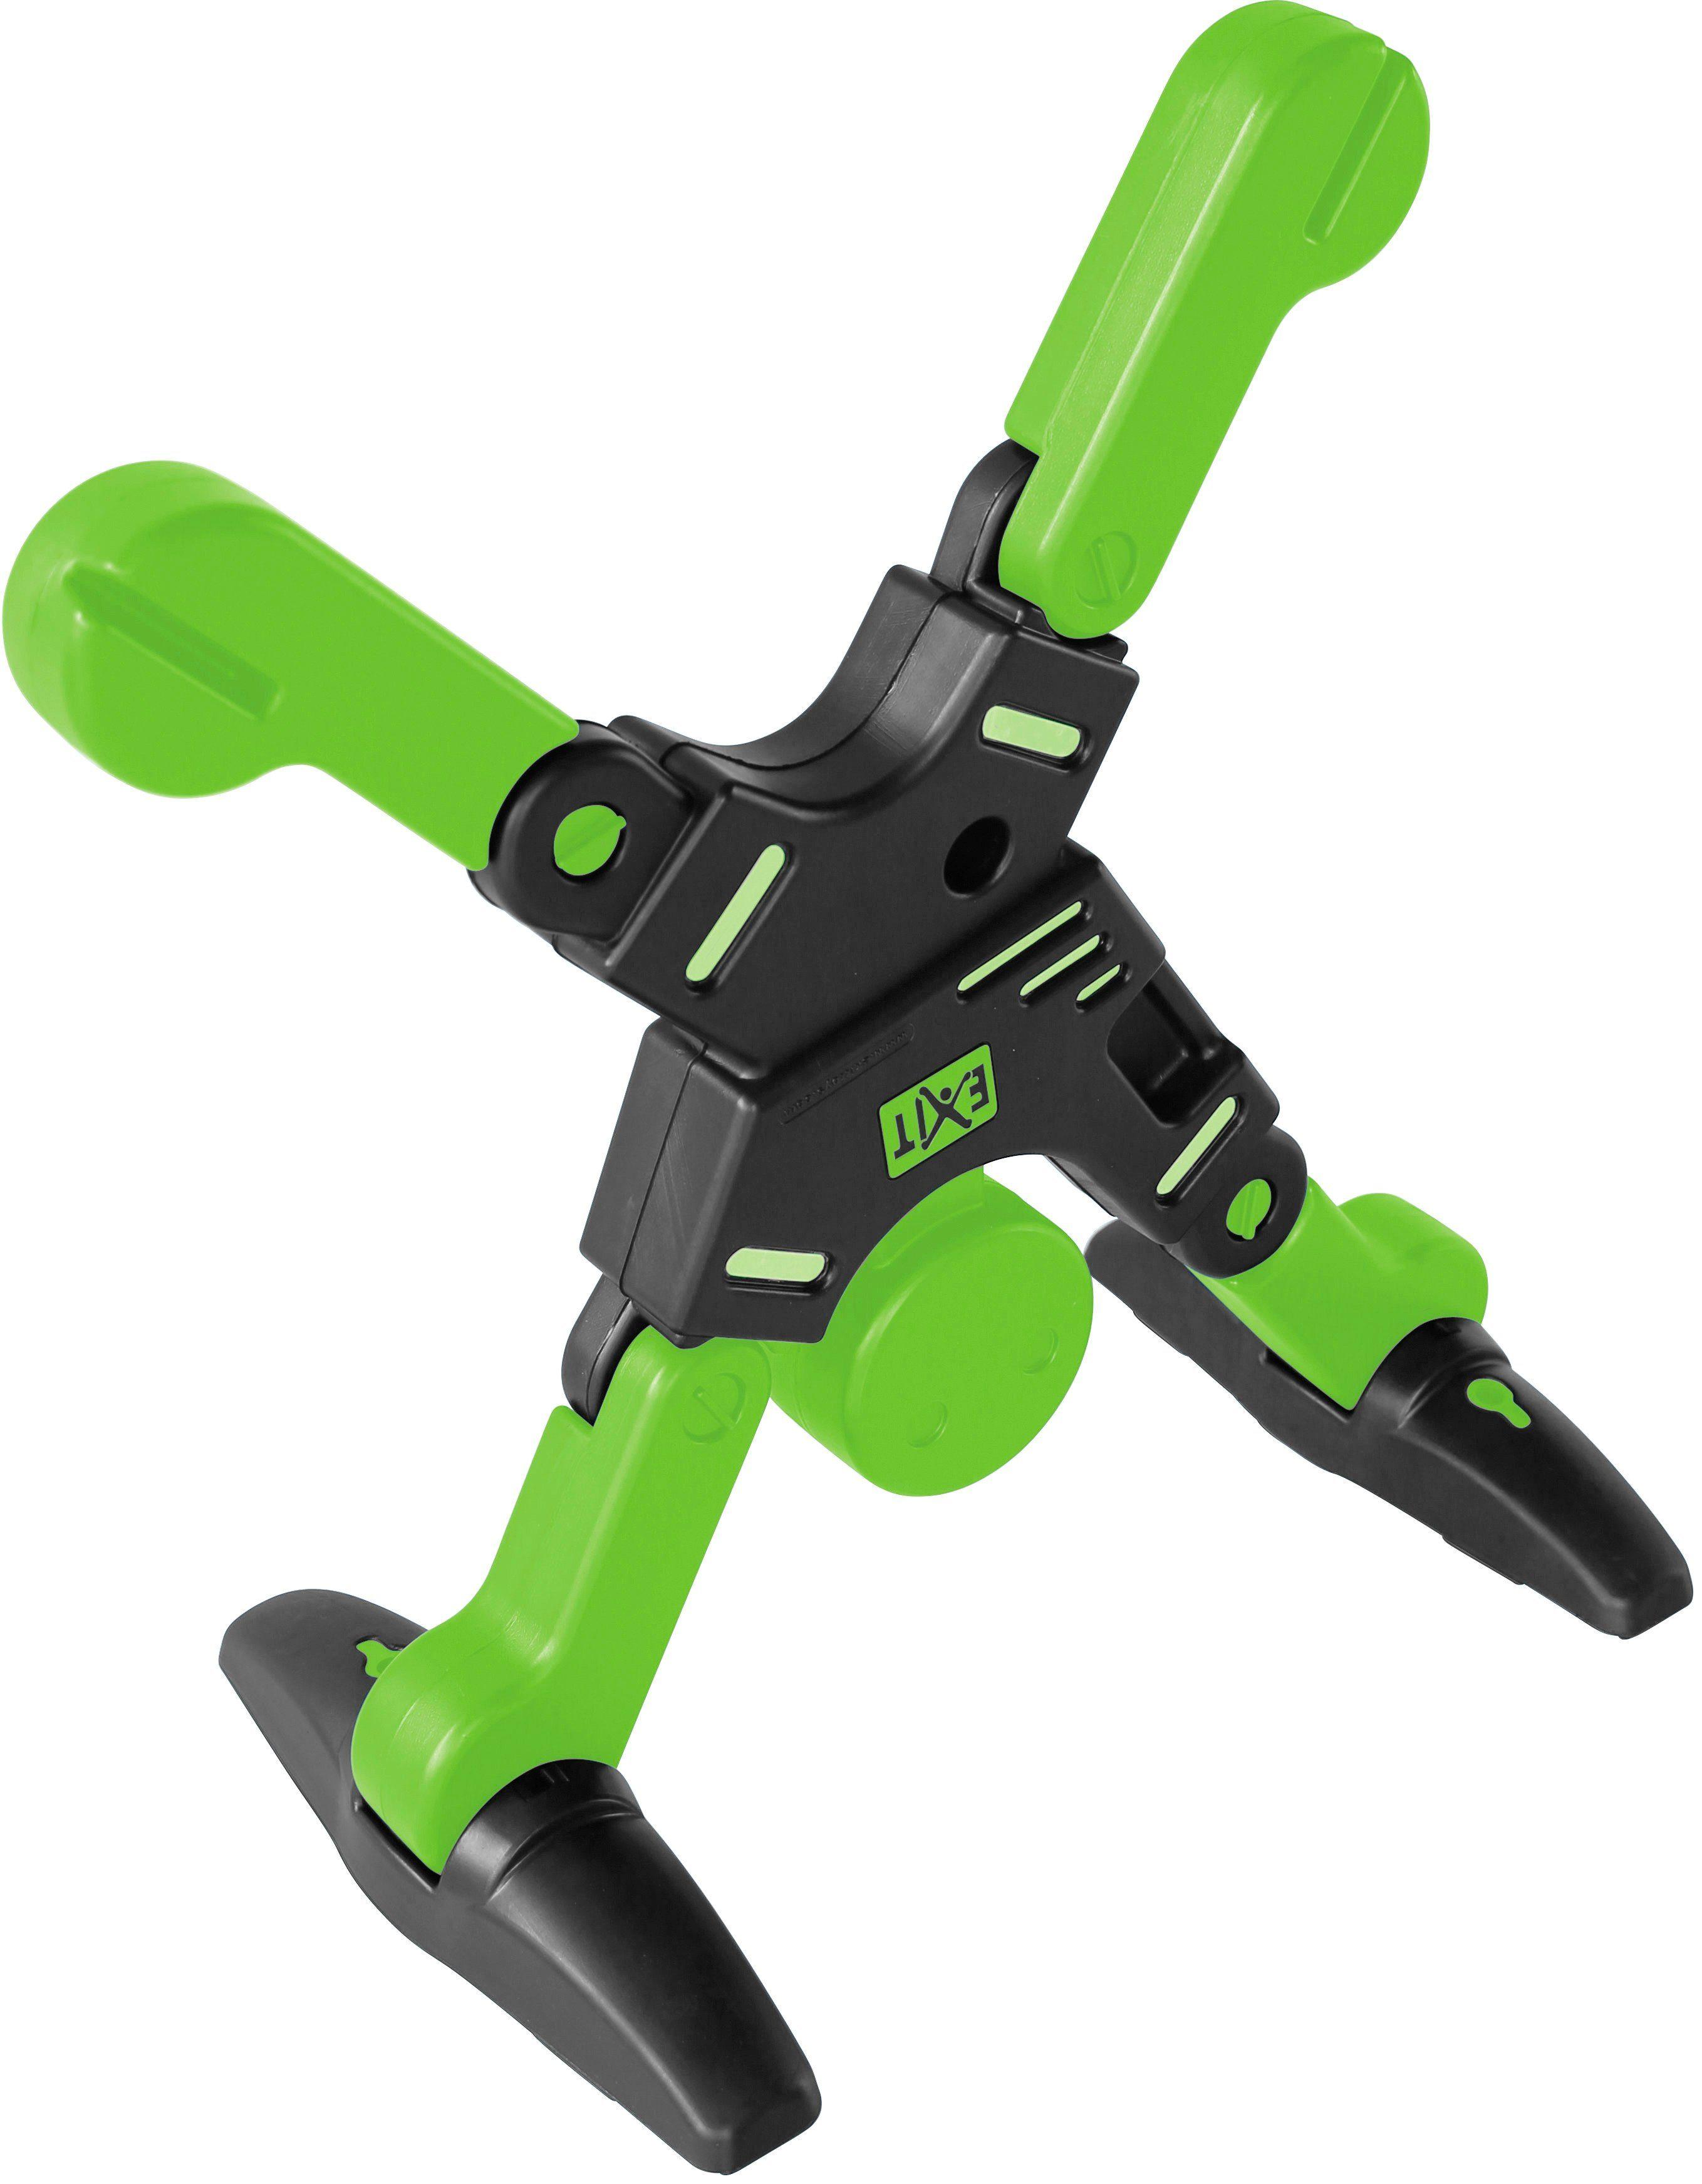 EXIT Speelgoed »EXIT X Man Safety Keeper« in de online shop